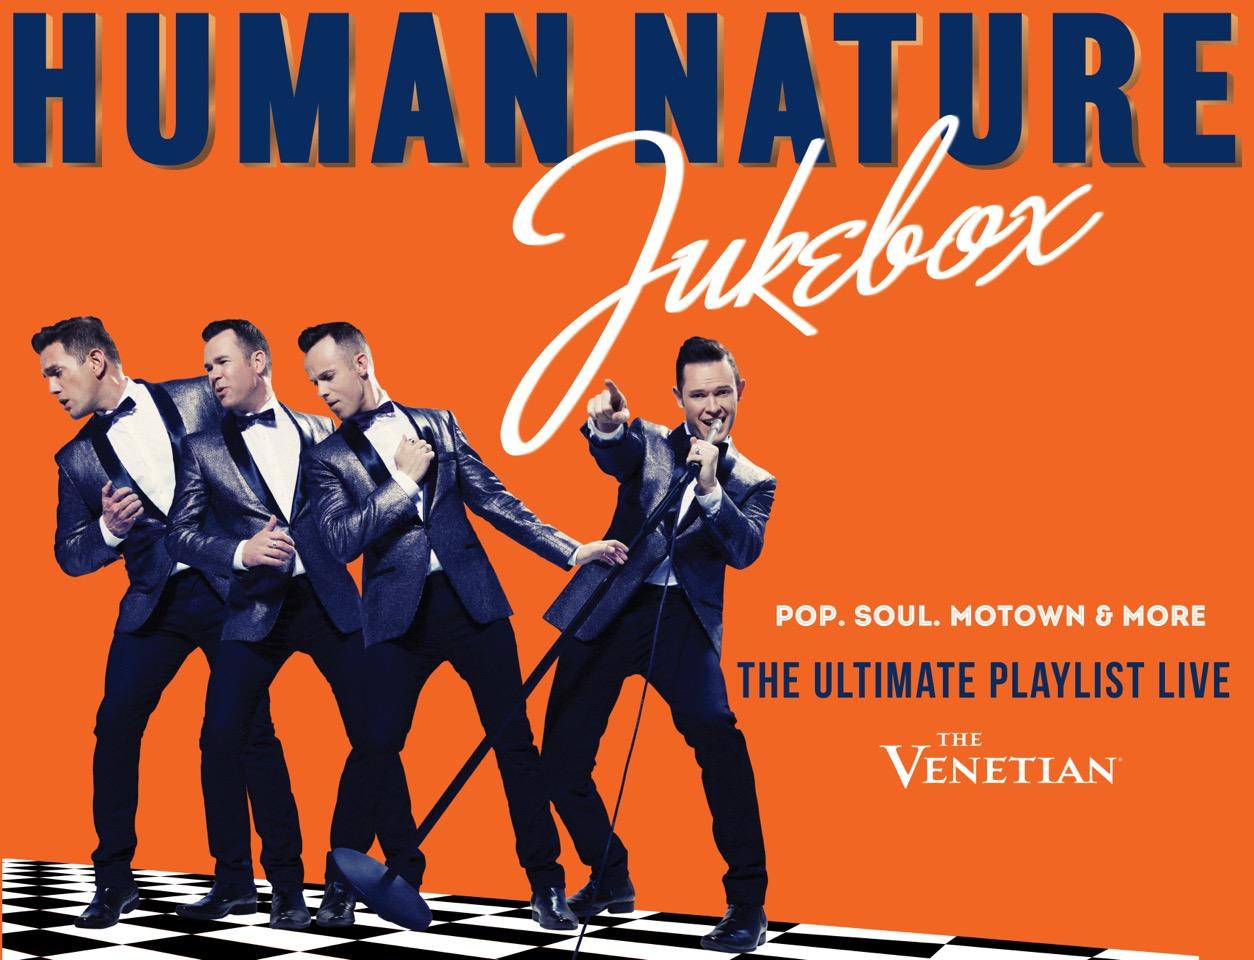 Human Nature Venetian Discount Tickets